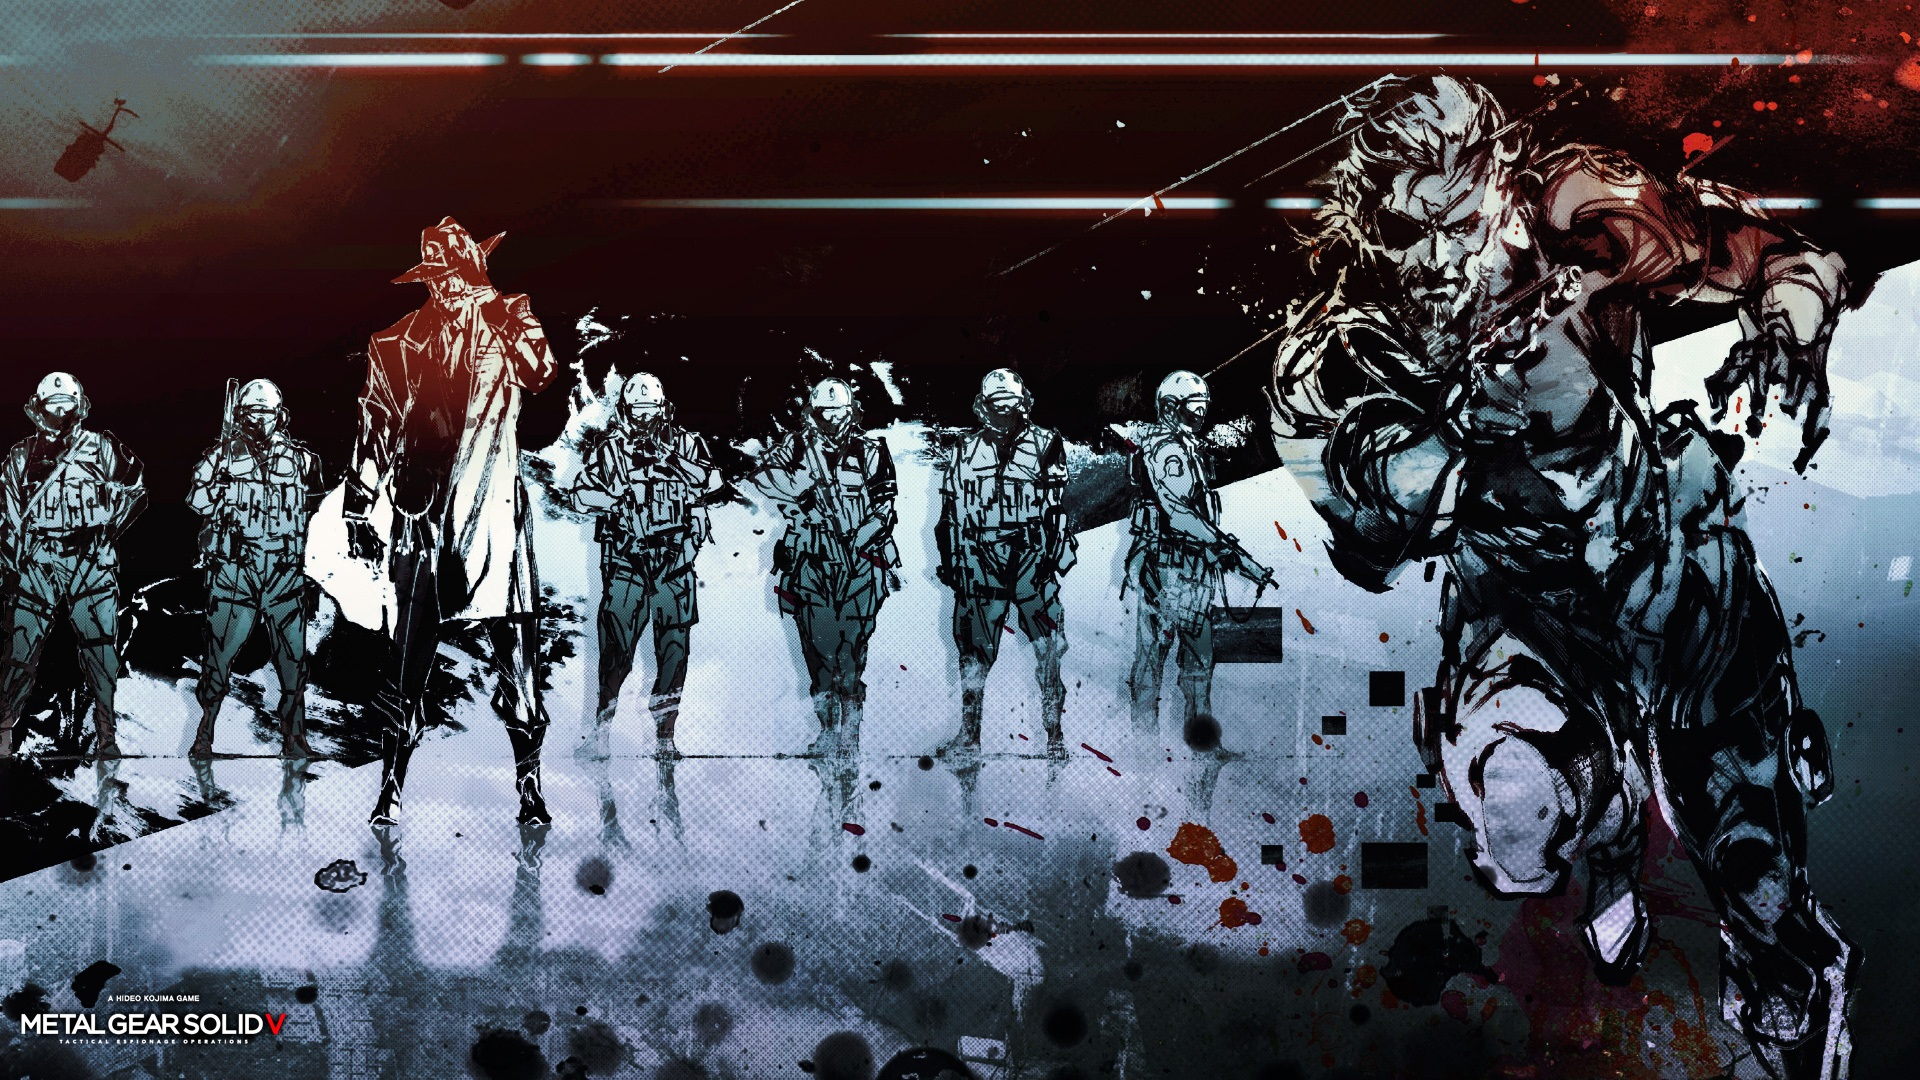 Metal Gear Solid V Wallpaper Sketch Characters